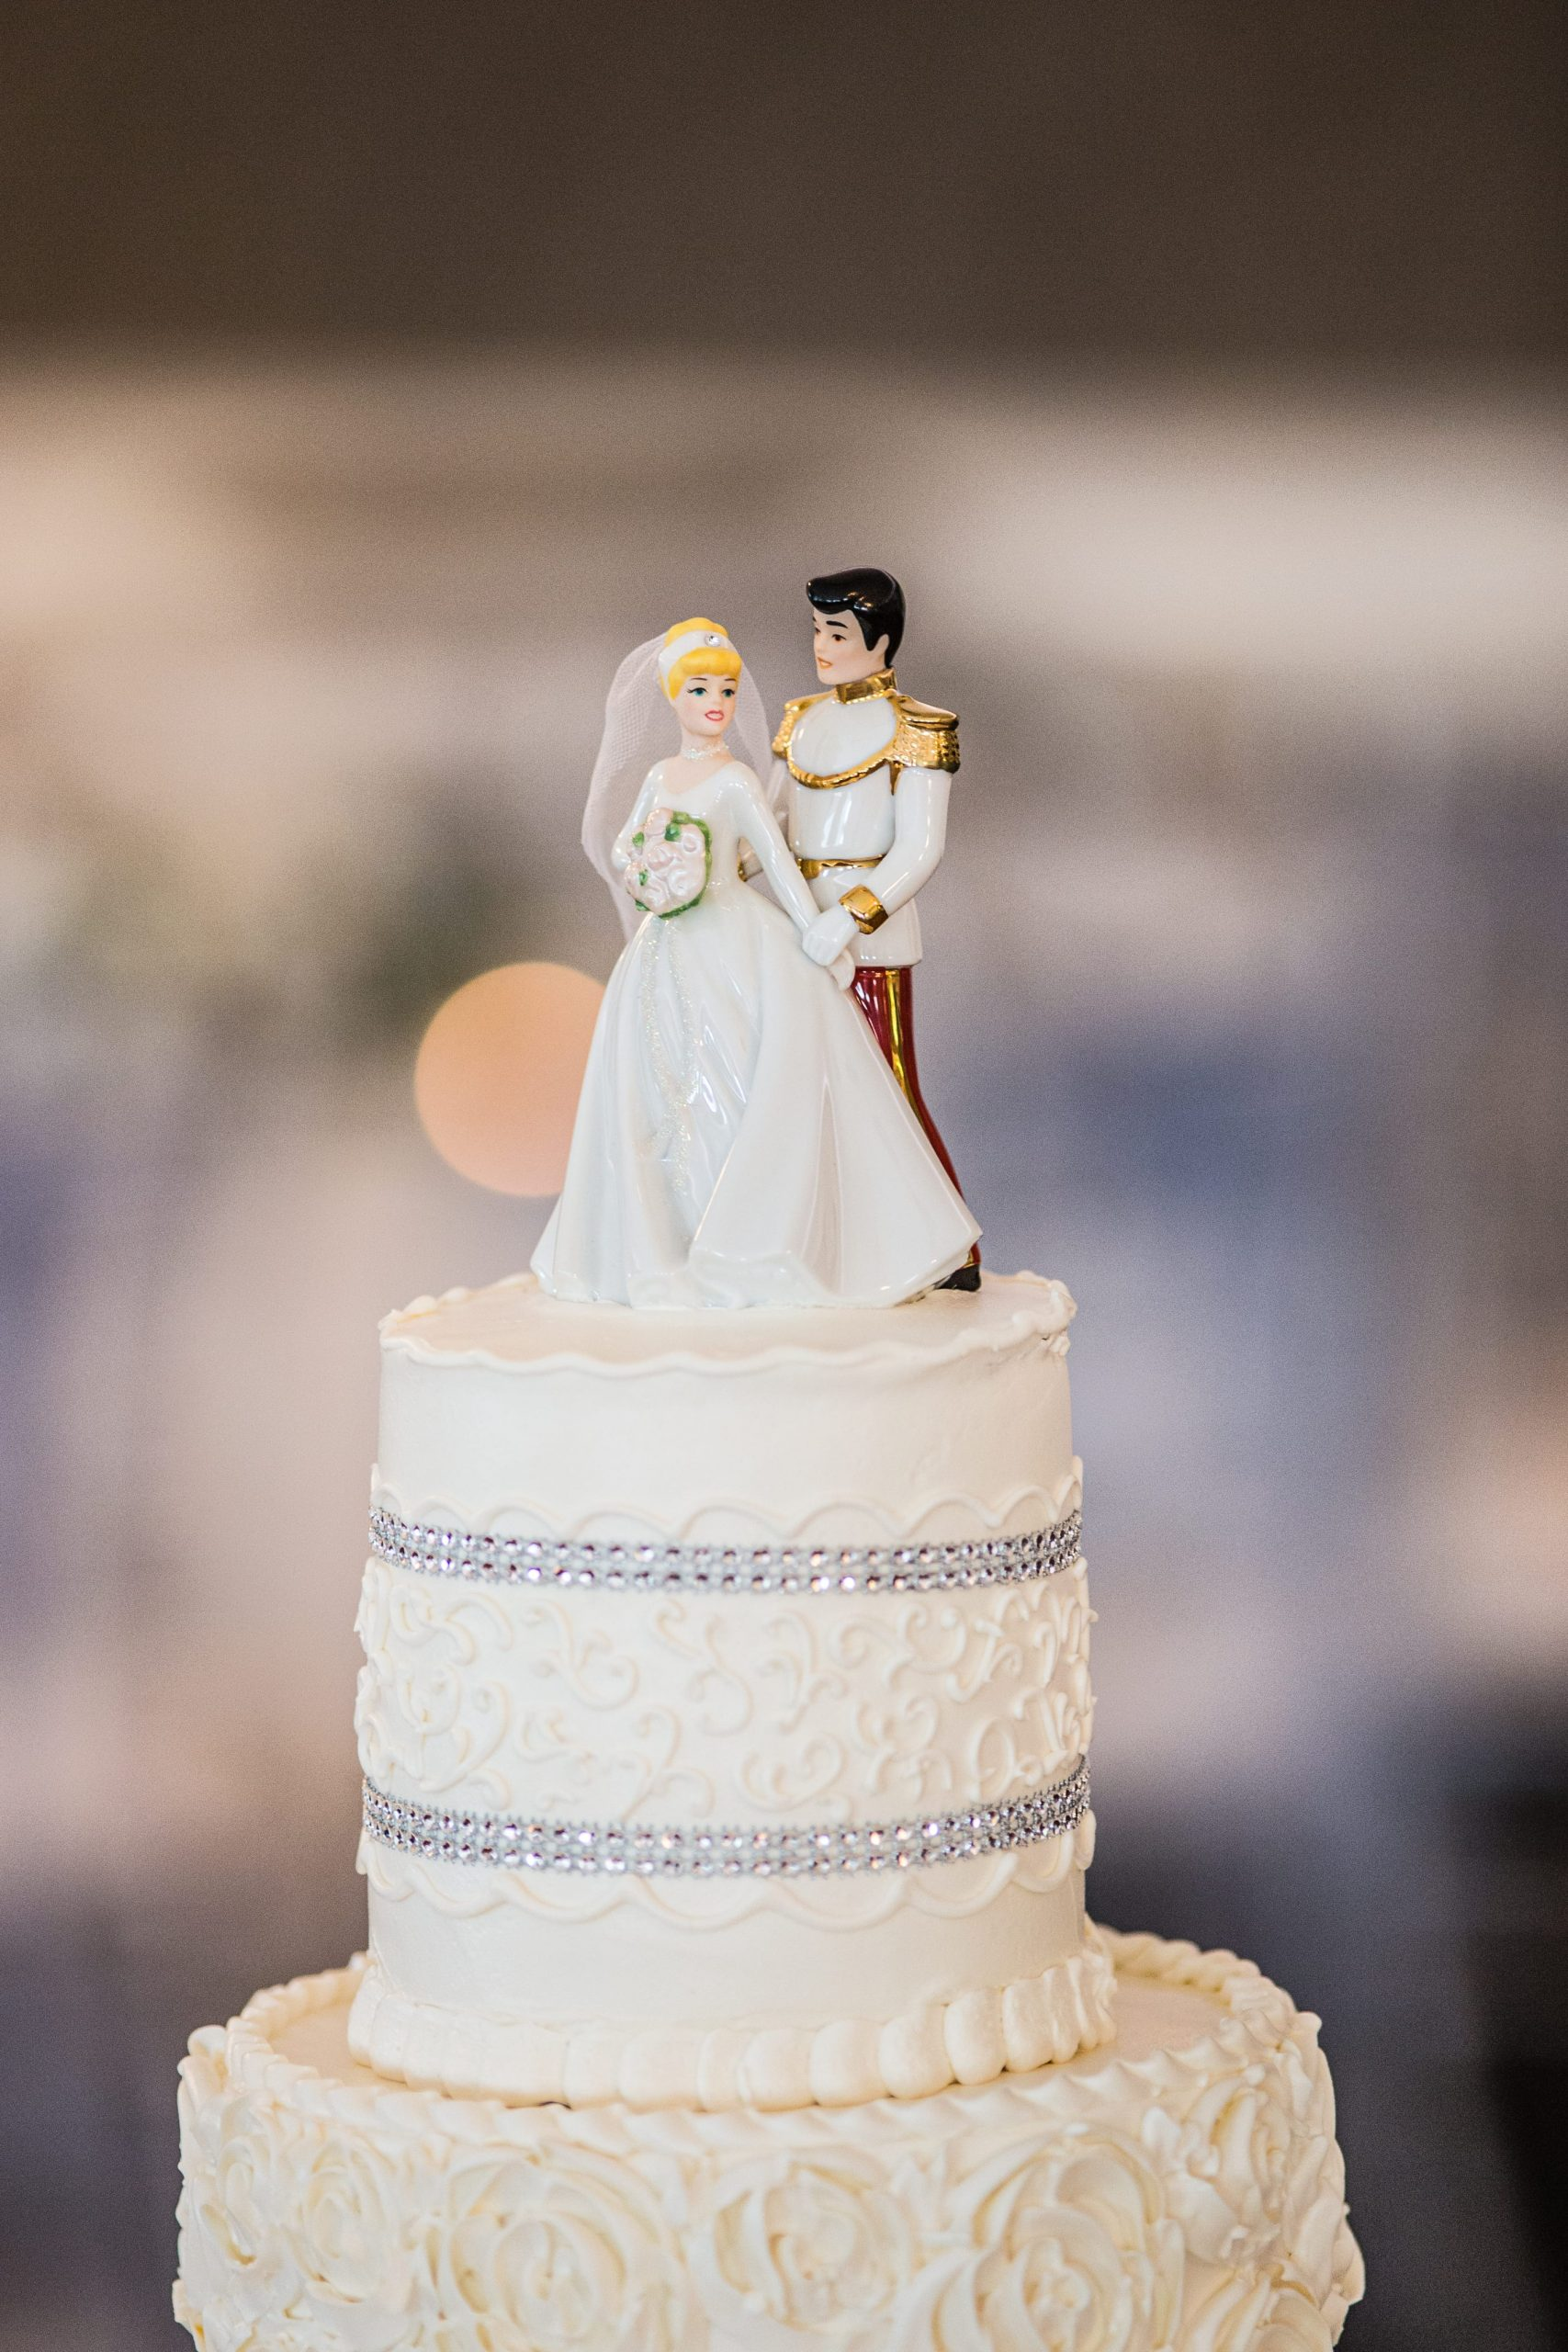 cinderella & prince charming wedding cake topper